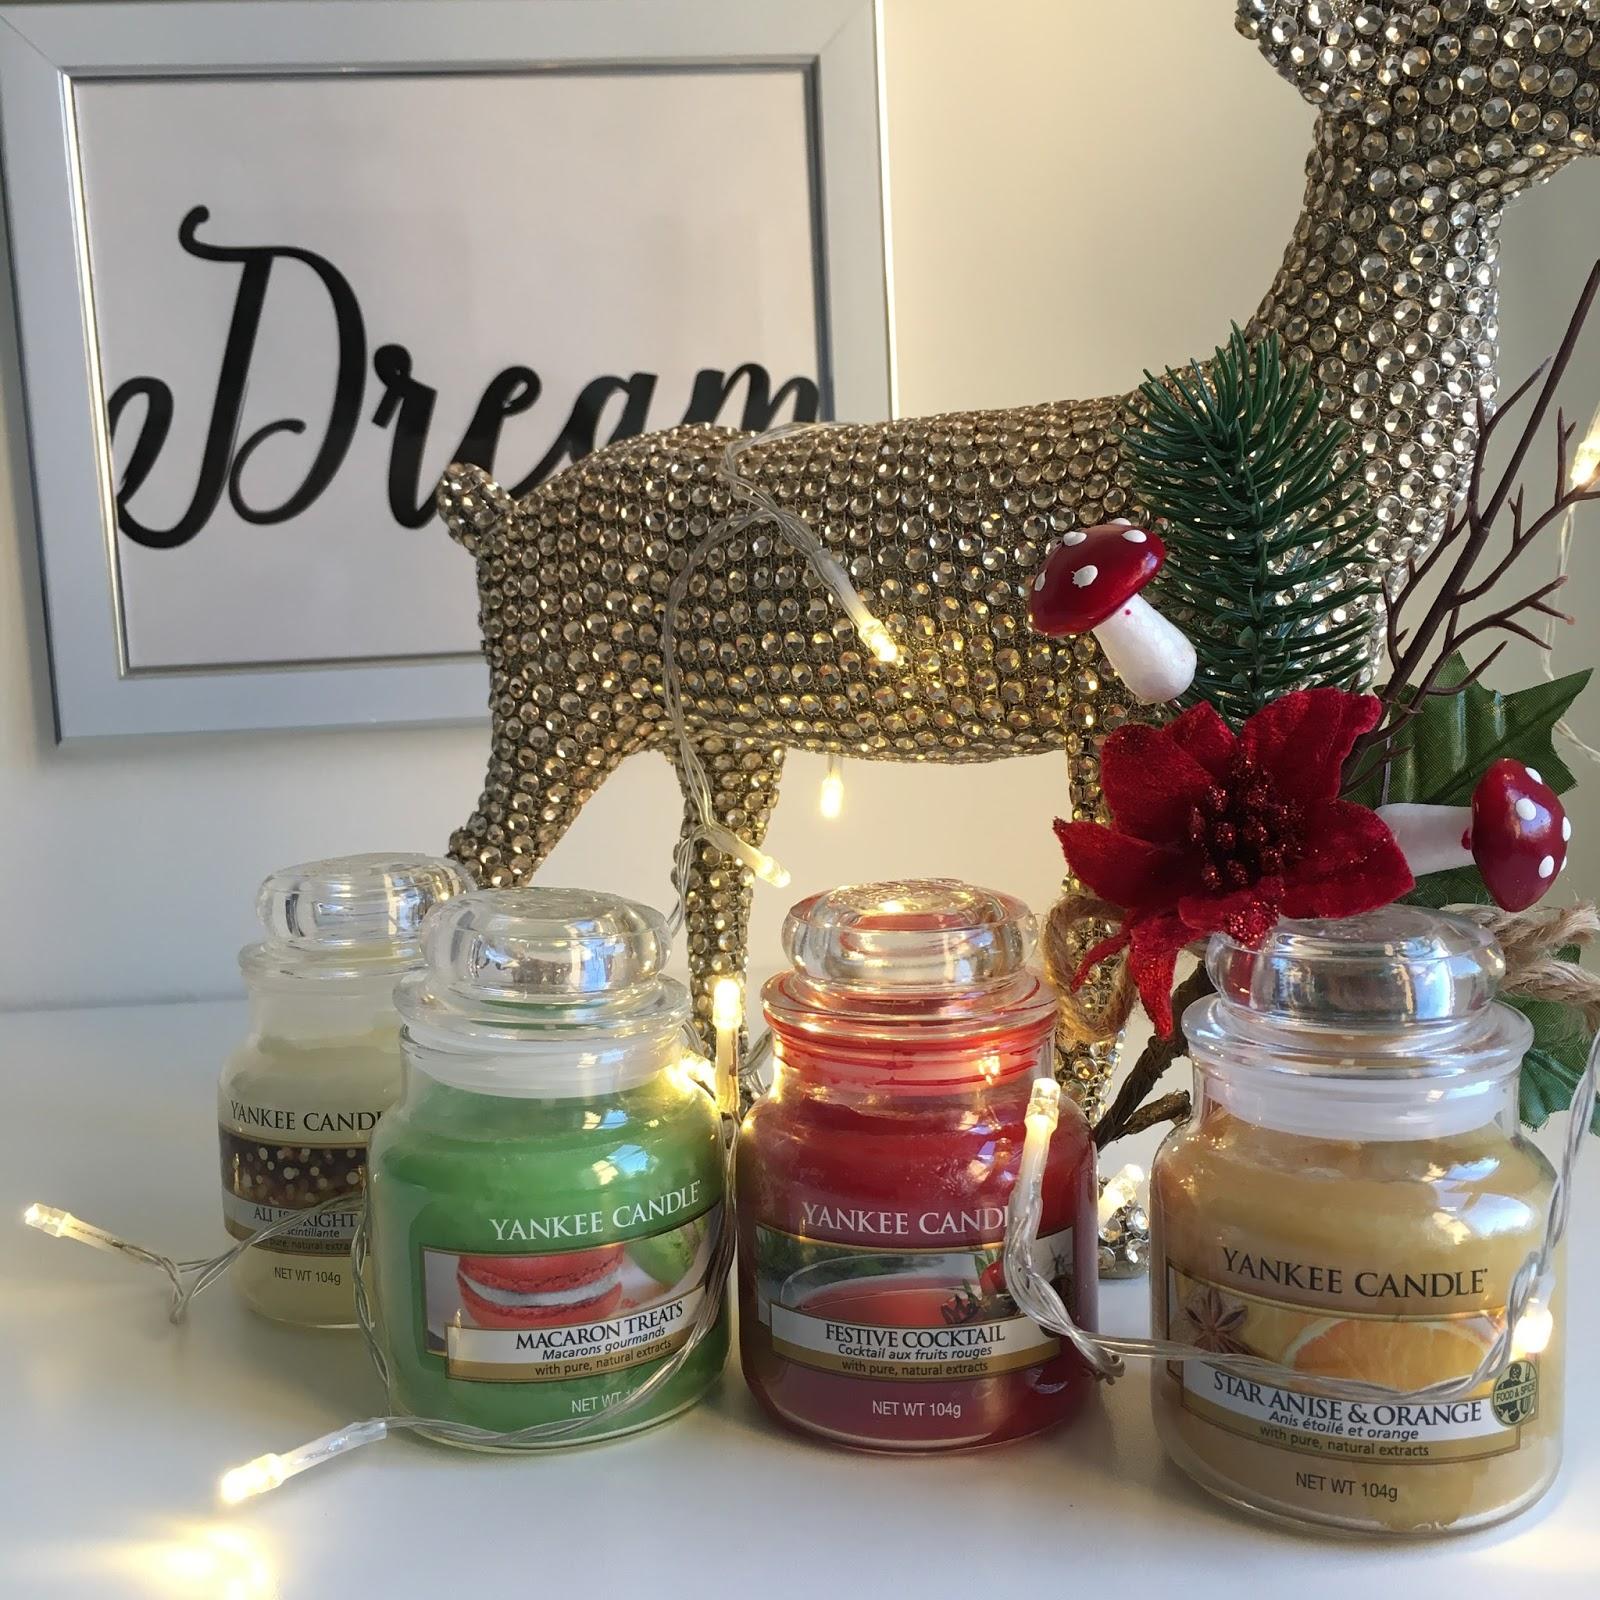 Yankee Candle Christmas Range